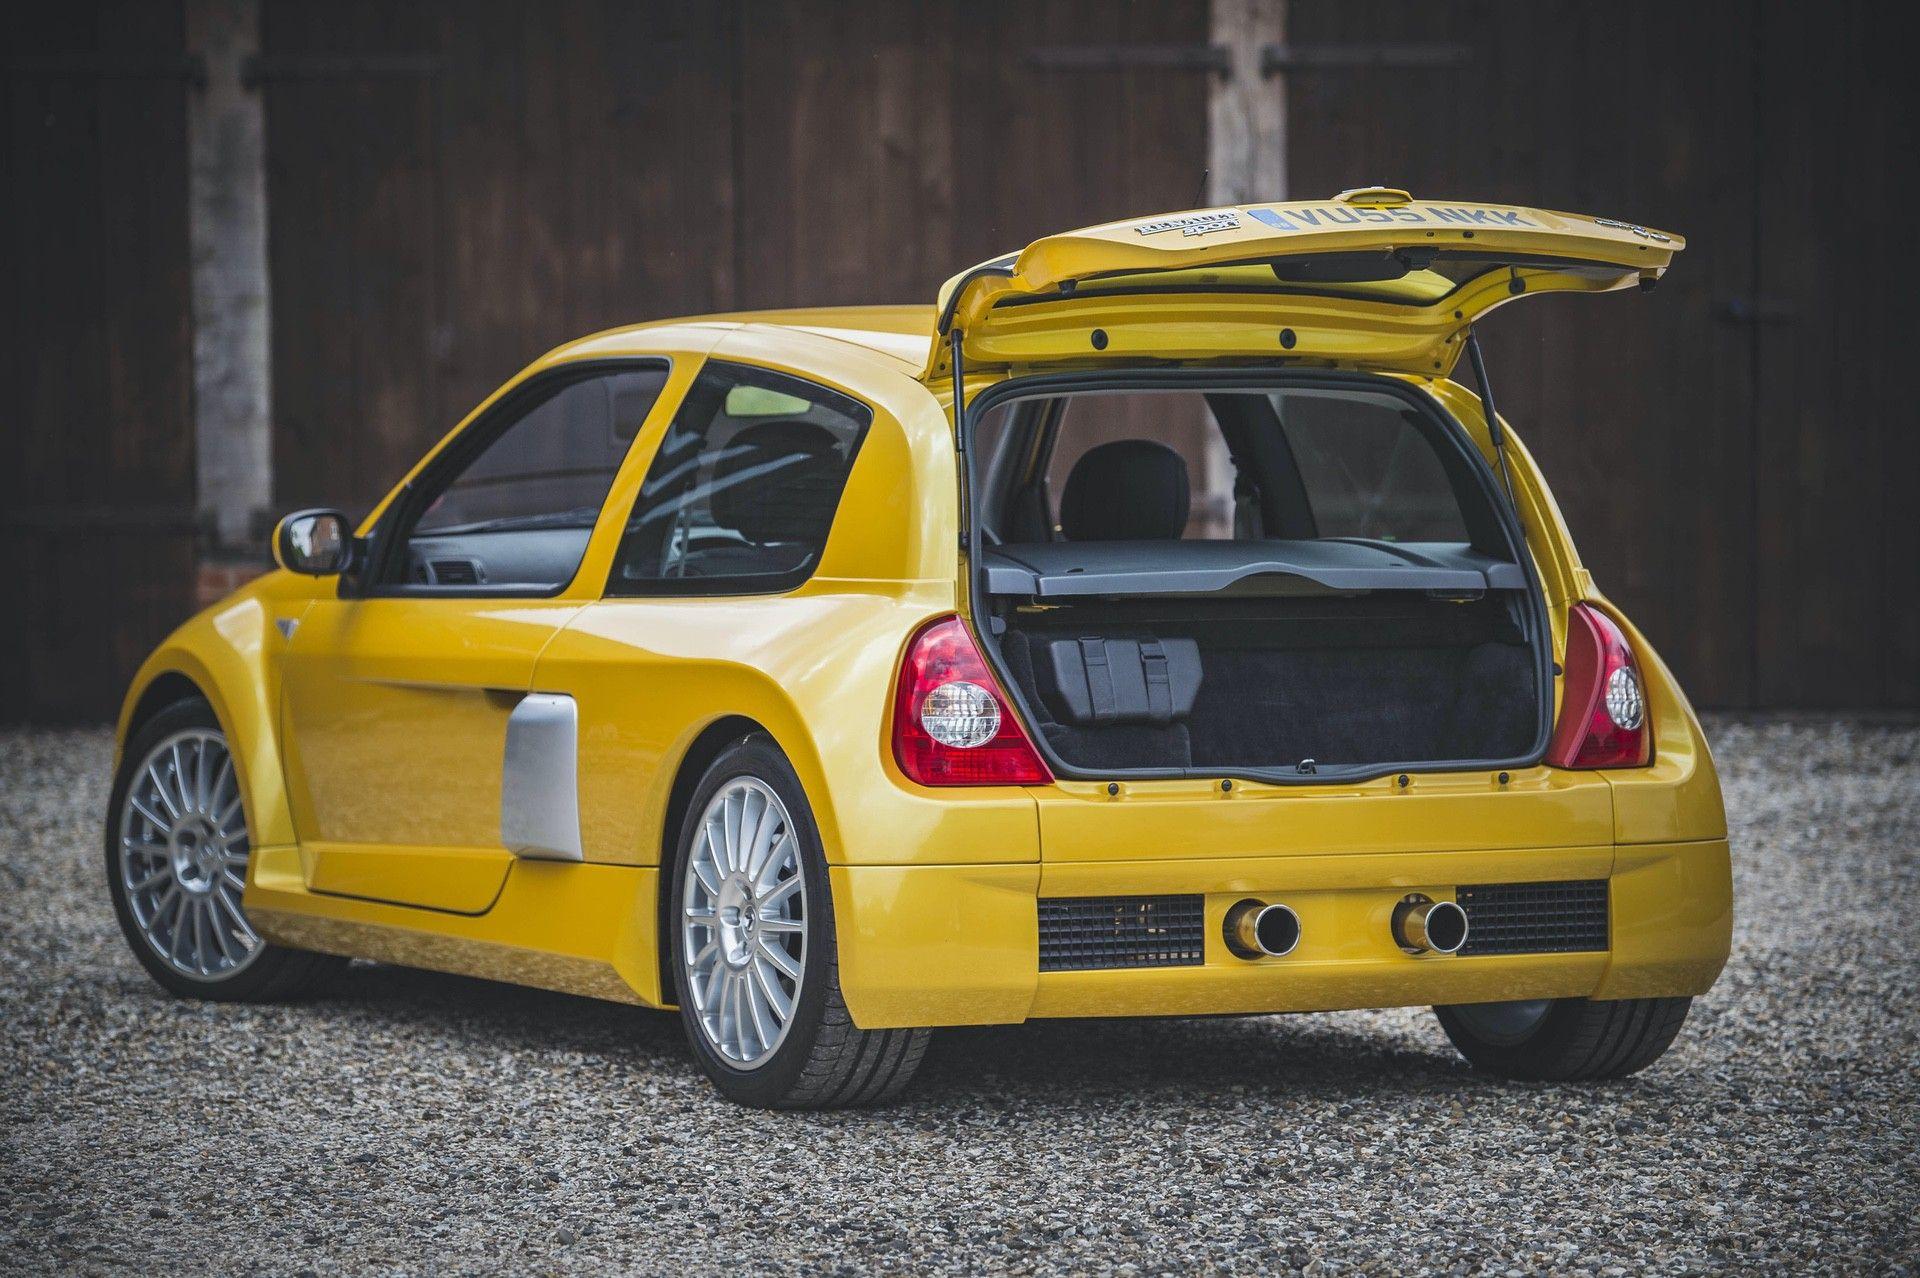 2005_Renault_Clio_V6_Phase_2_0026